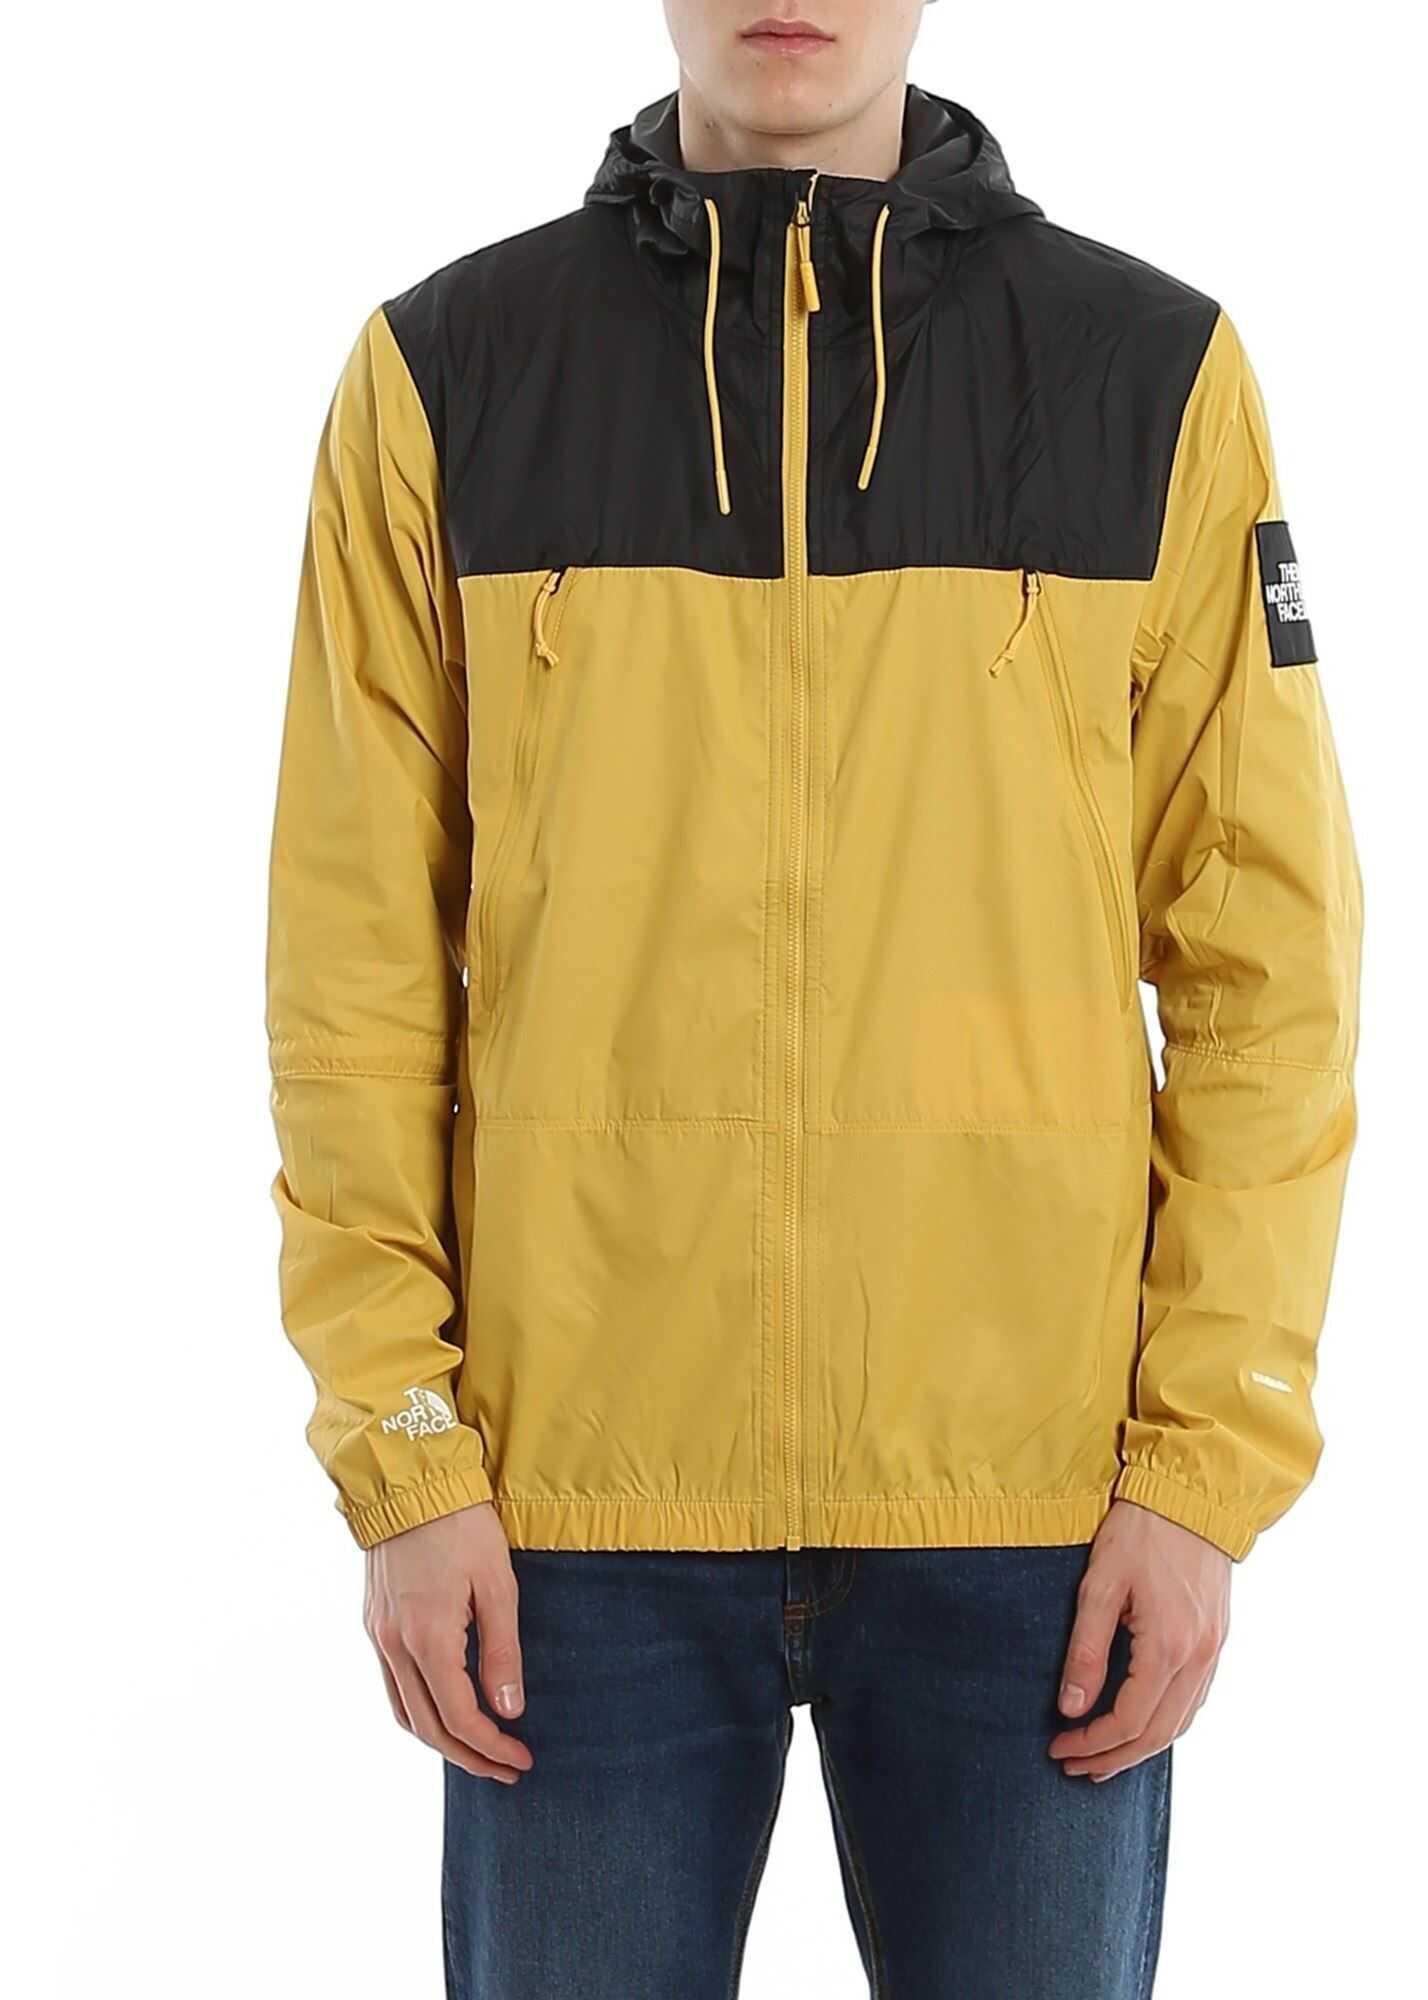 The North Face Two-Tone Nylon Windbreaker Yellow